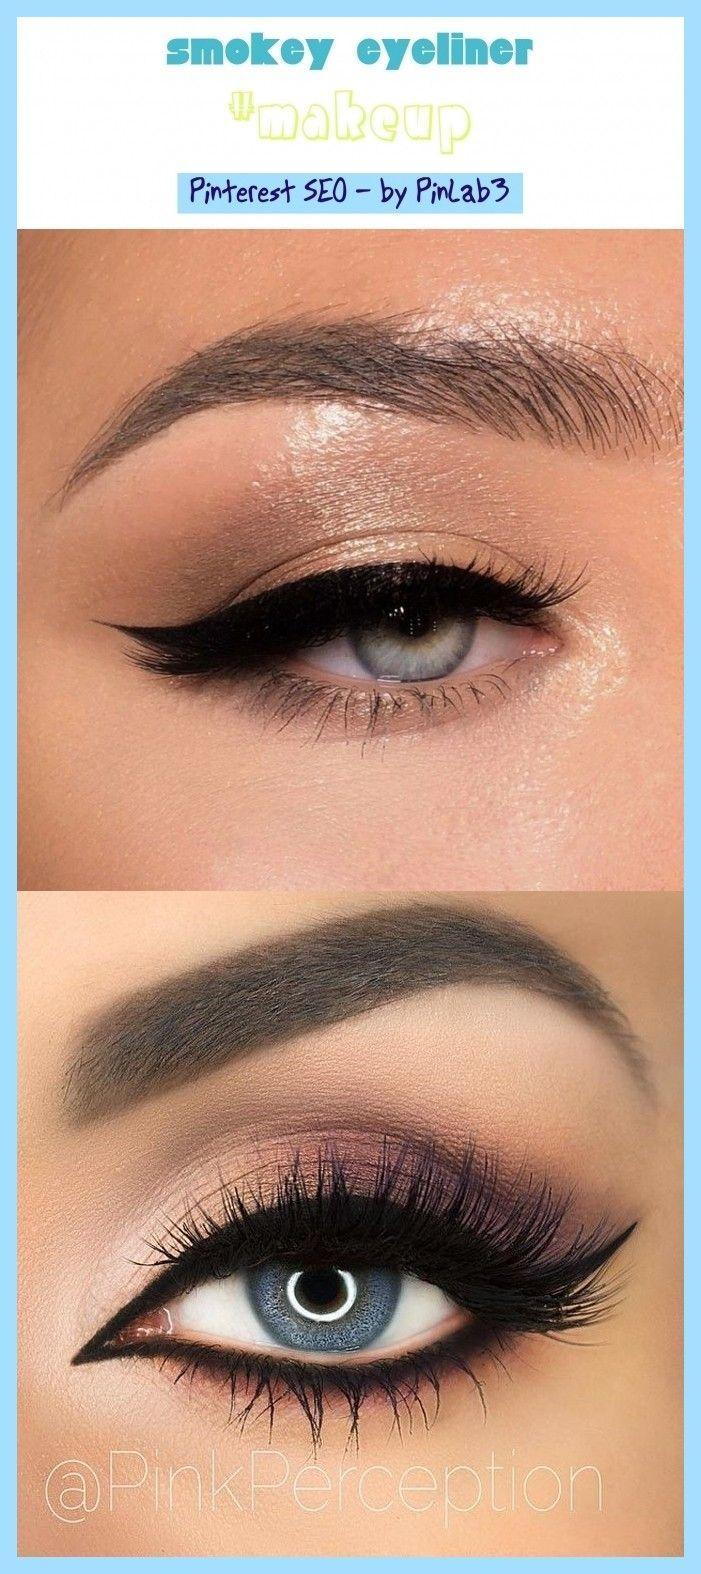 Smokey eyeliner -liner